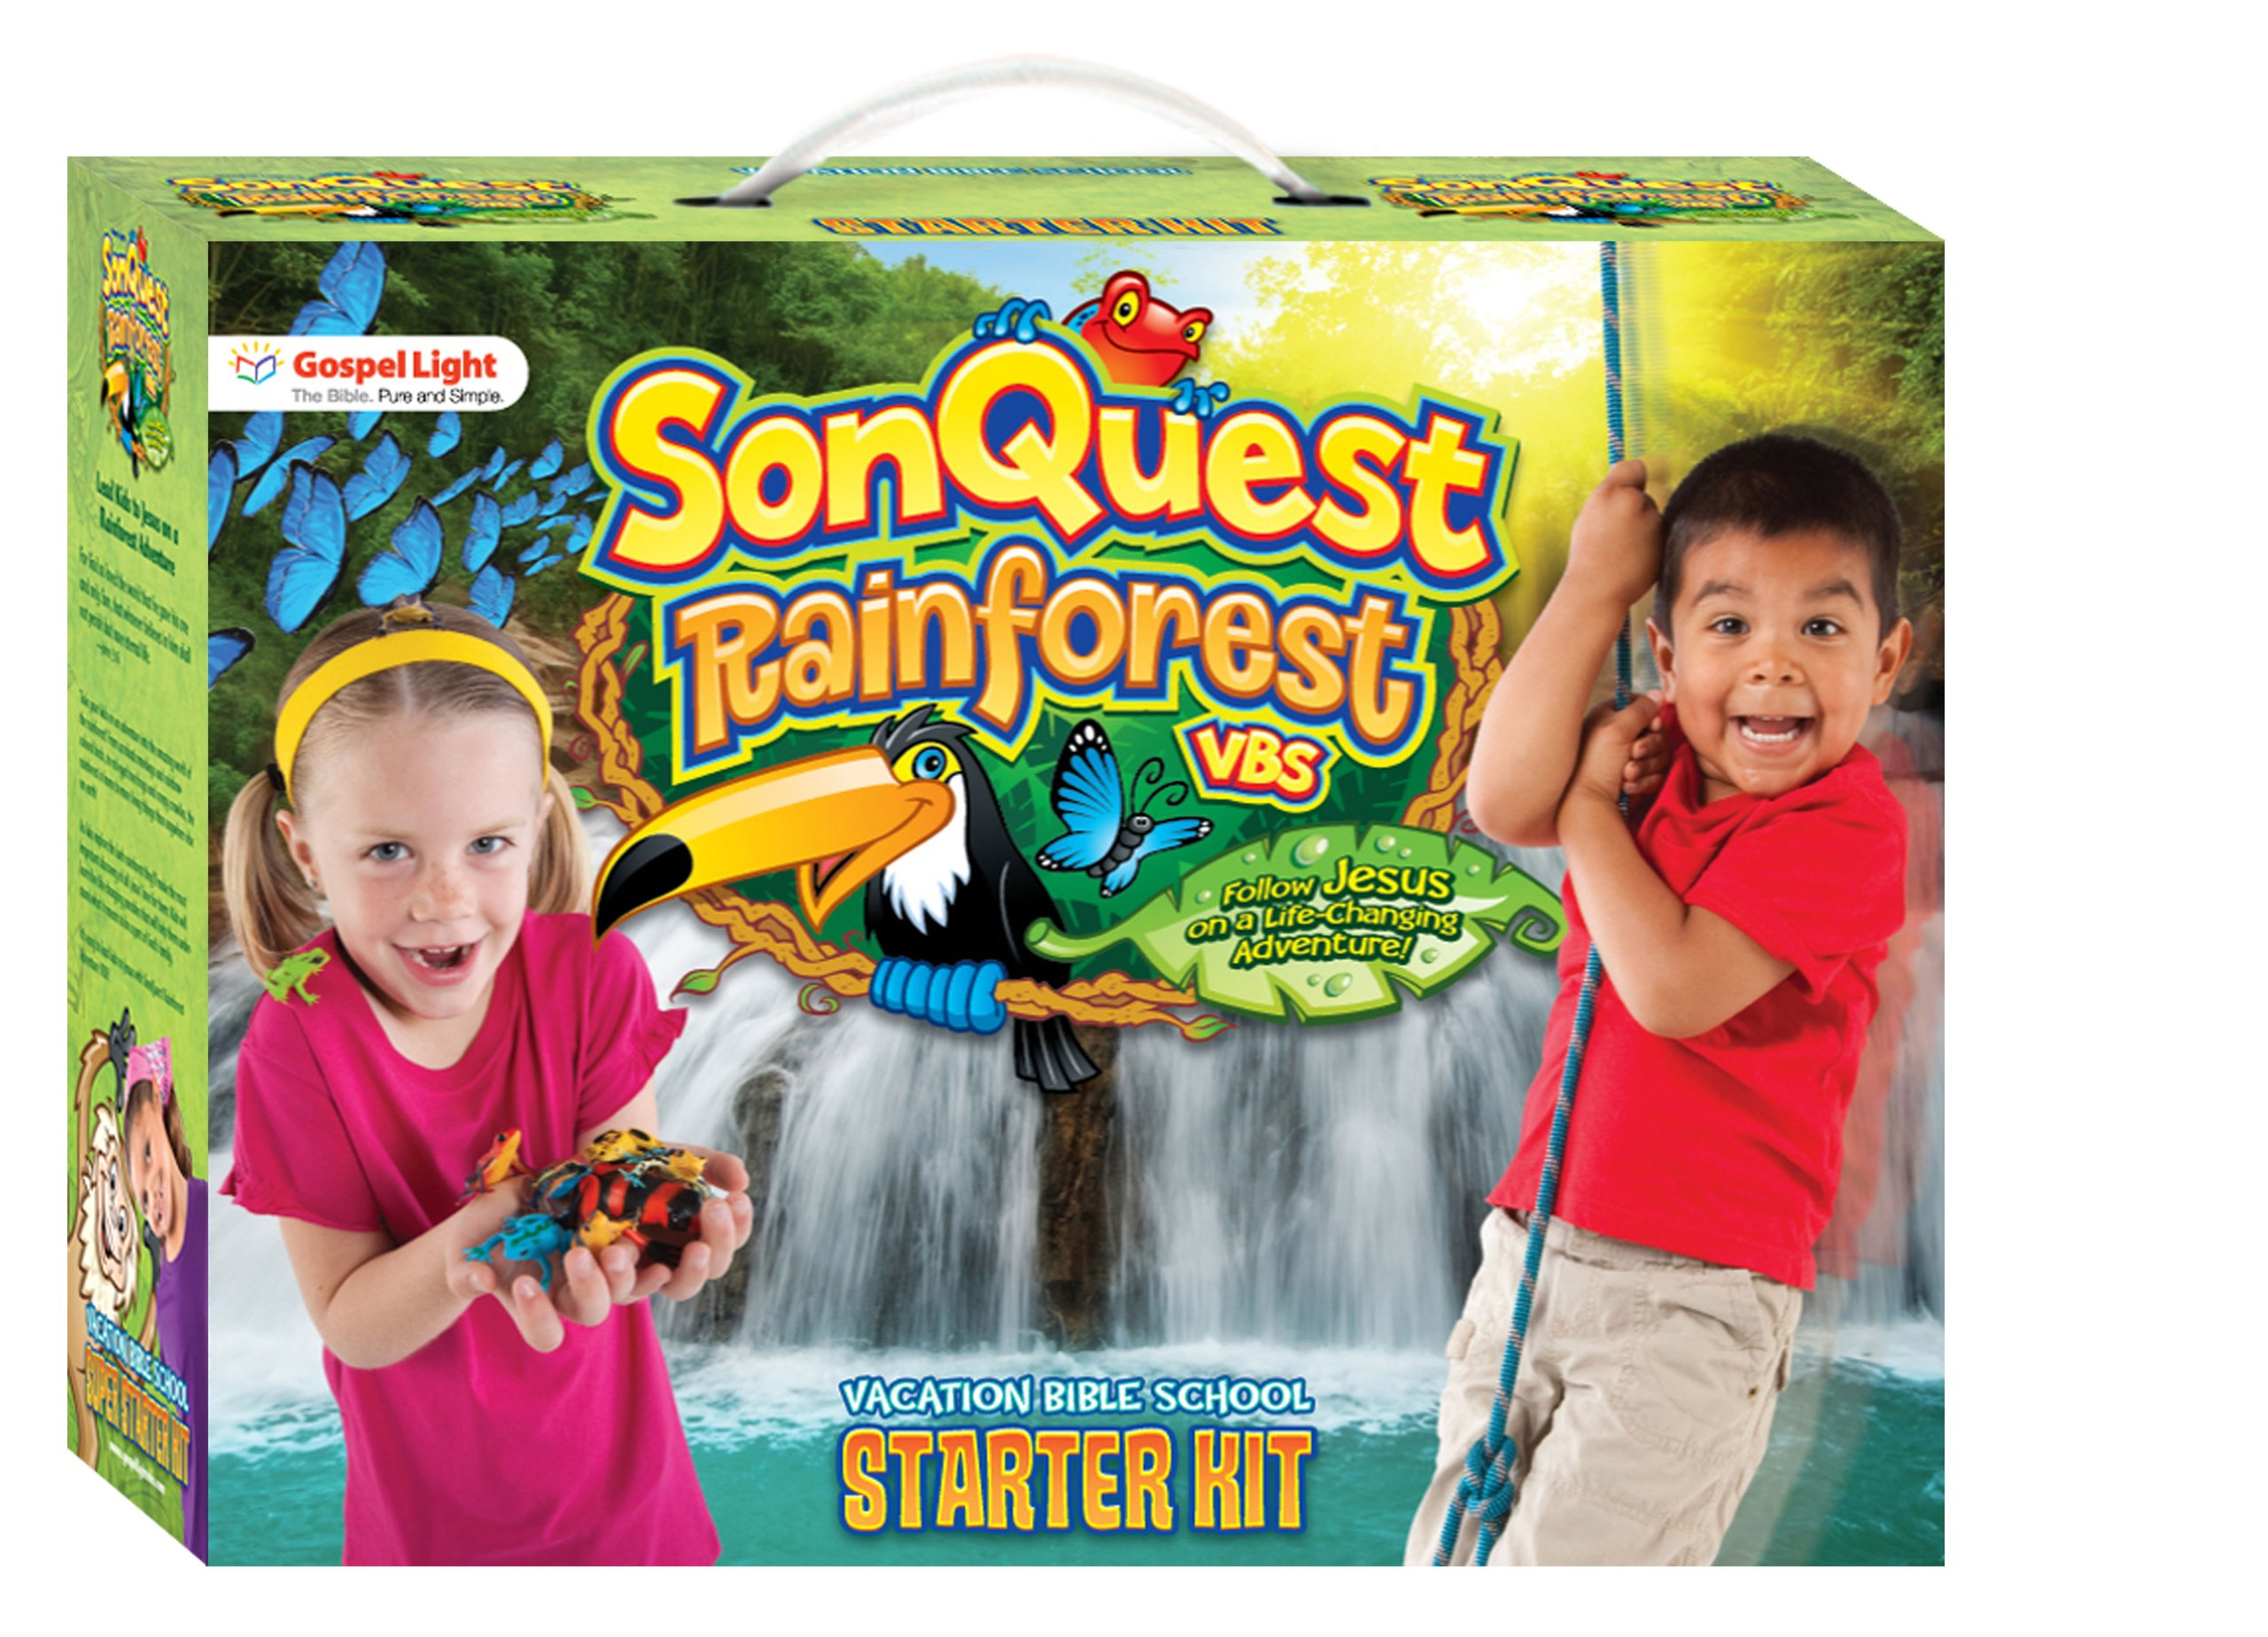 SonQuest Starter Kit BL (SonQuest Rainforest VBS): Gospel Light:  9780830752546: Amazon.com: Books